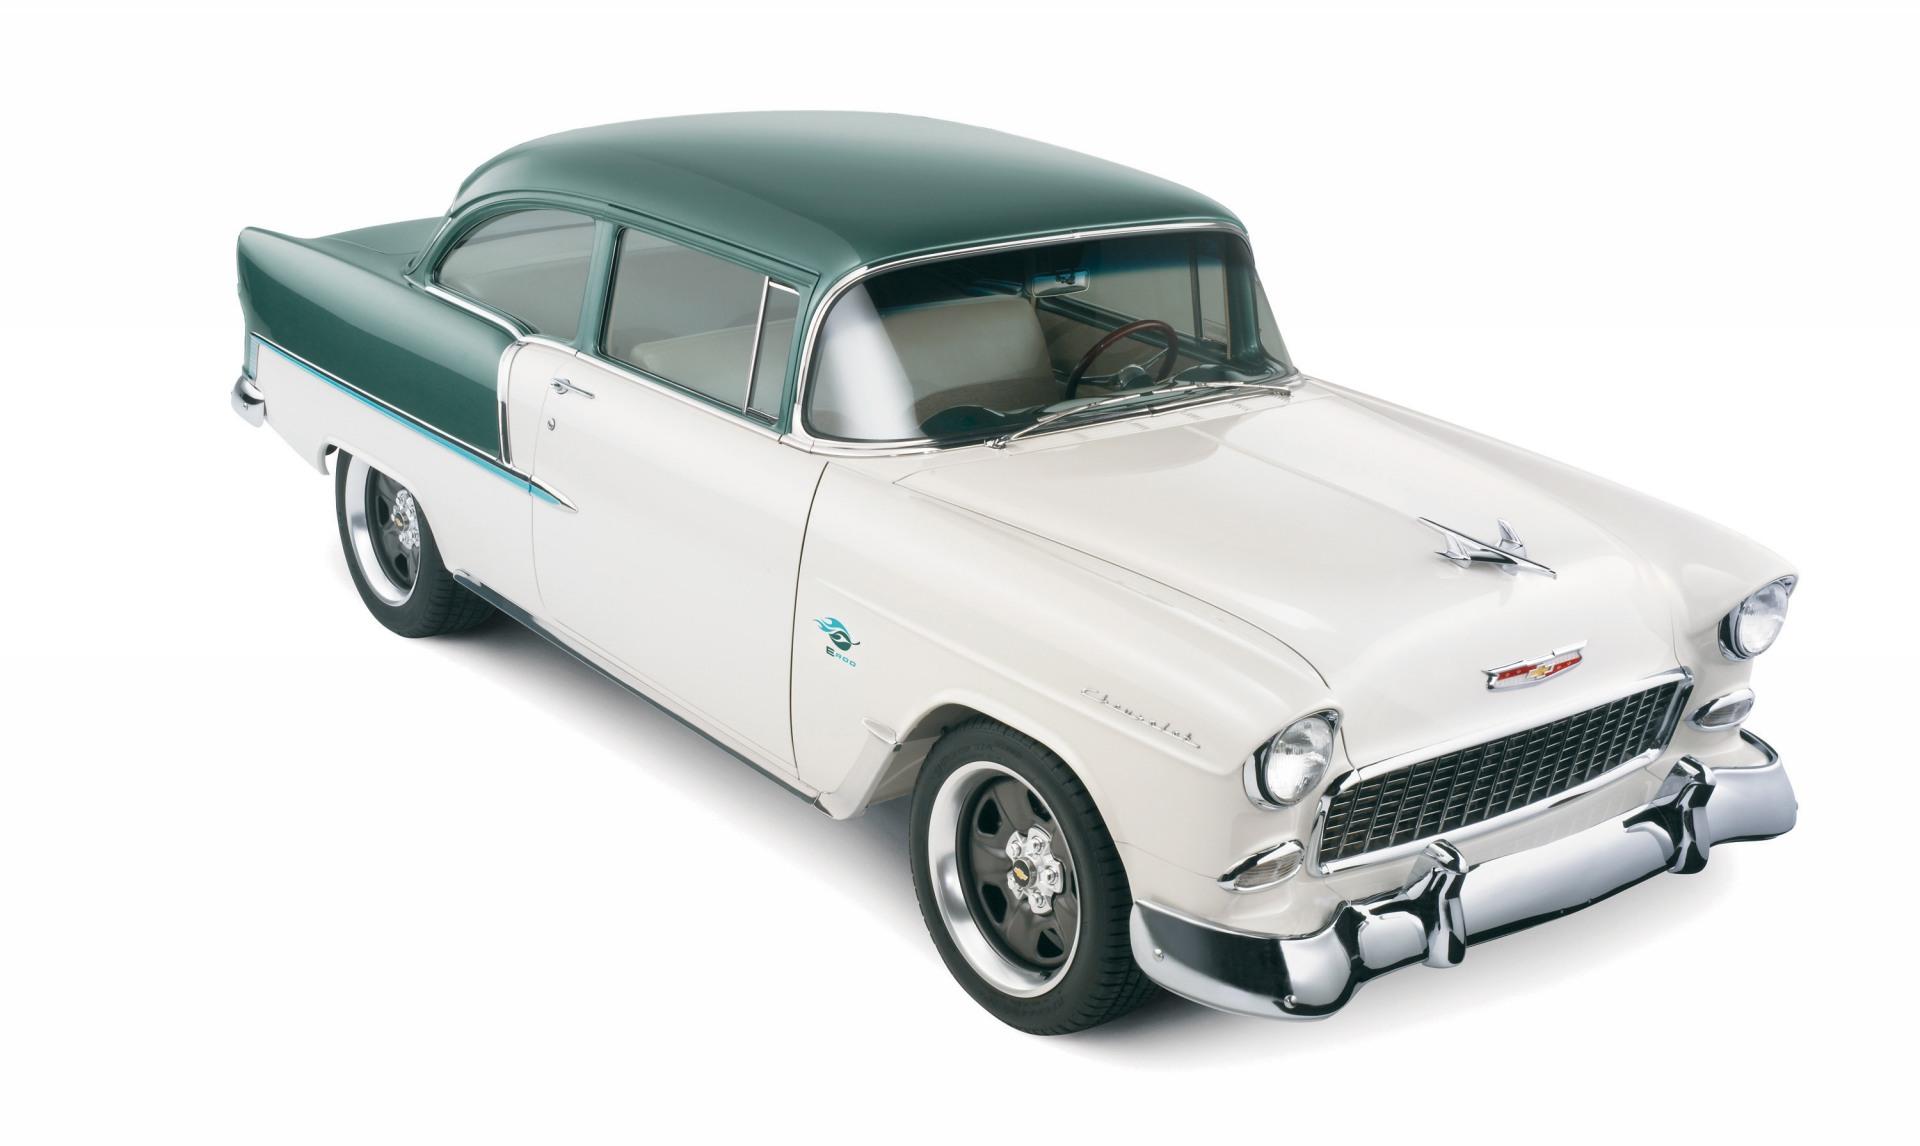 Bel Air Auto Auction >> 1955 Chevrolet E-ROD Bel Air Pictures, History, Value, Research, News - conceptcarz.com